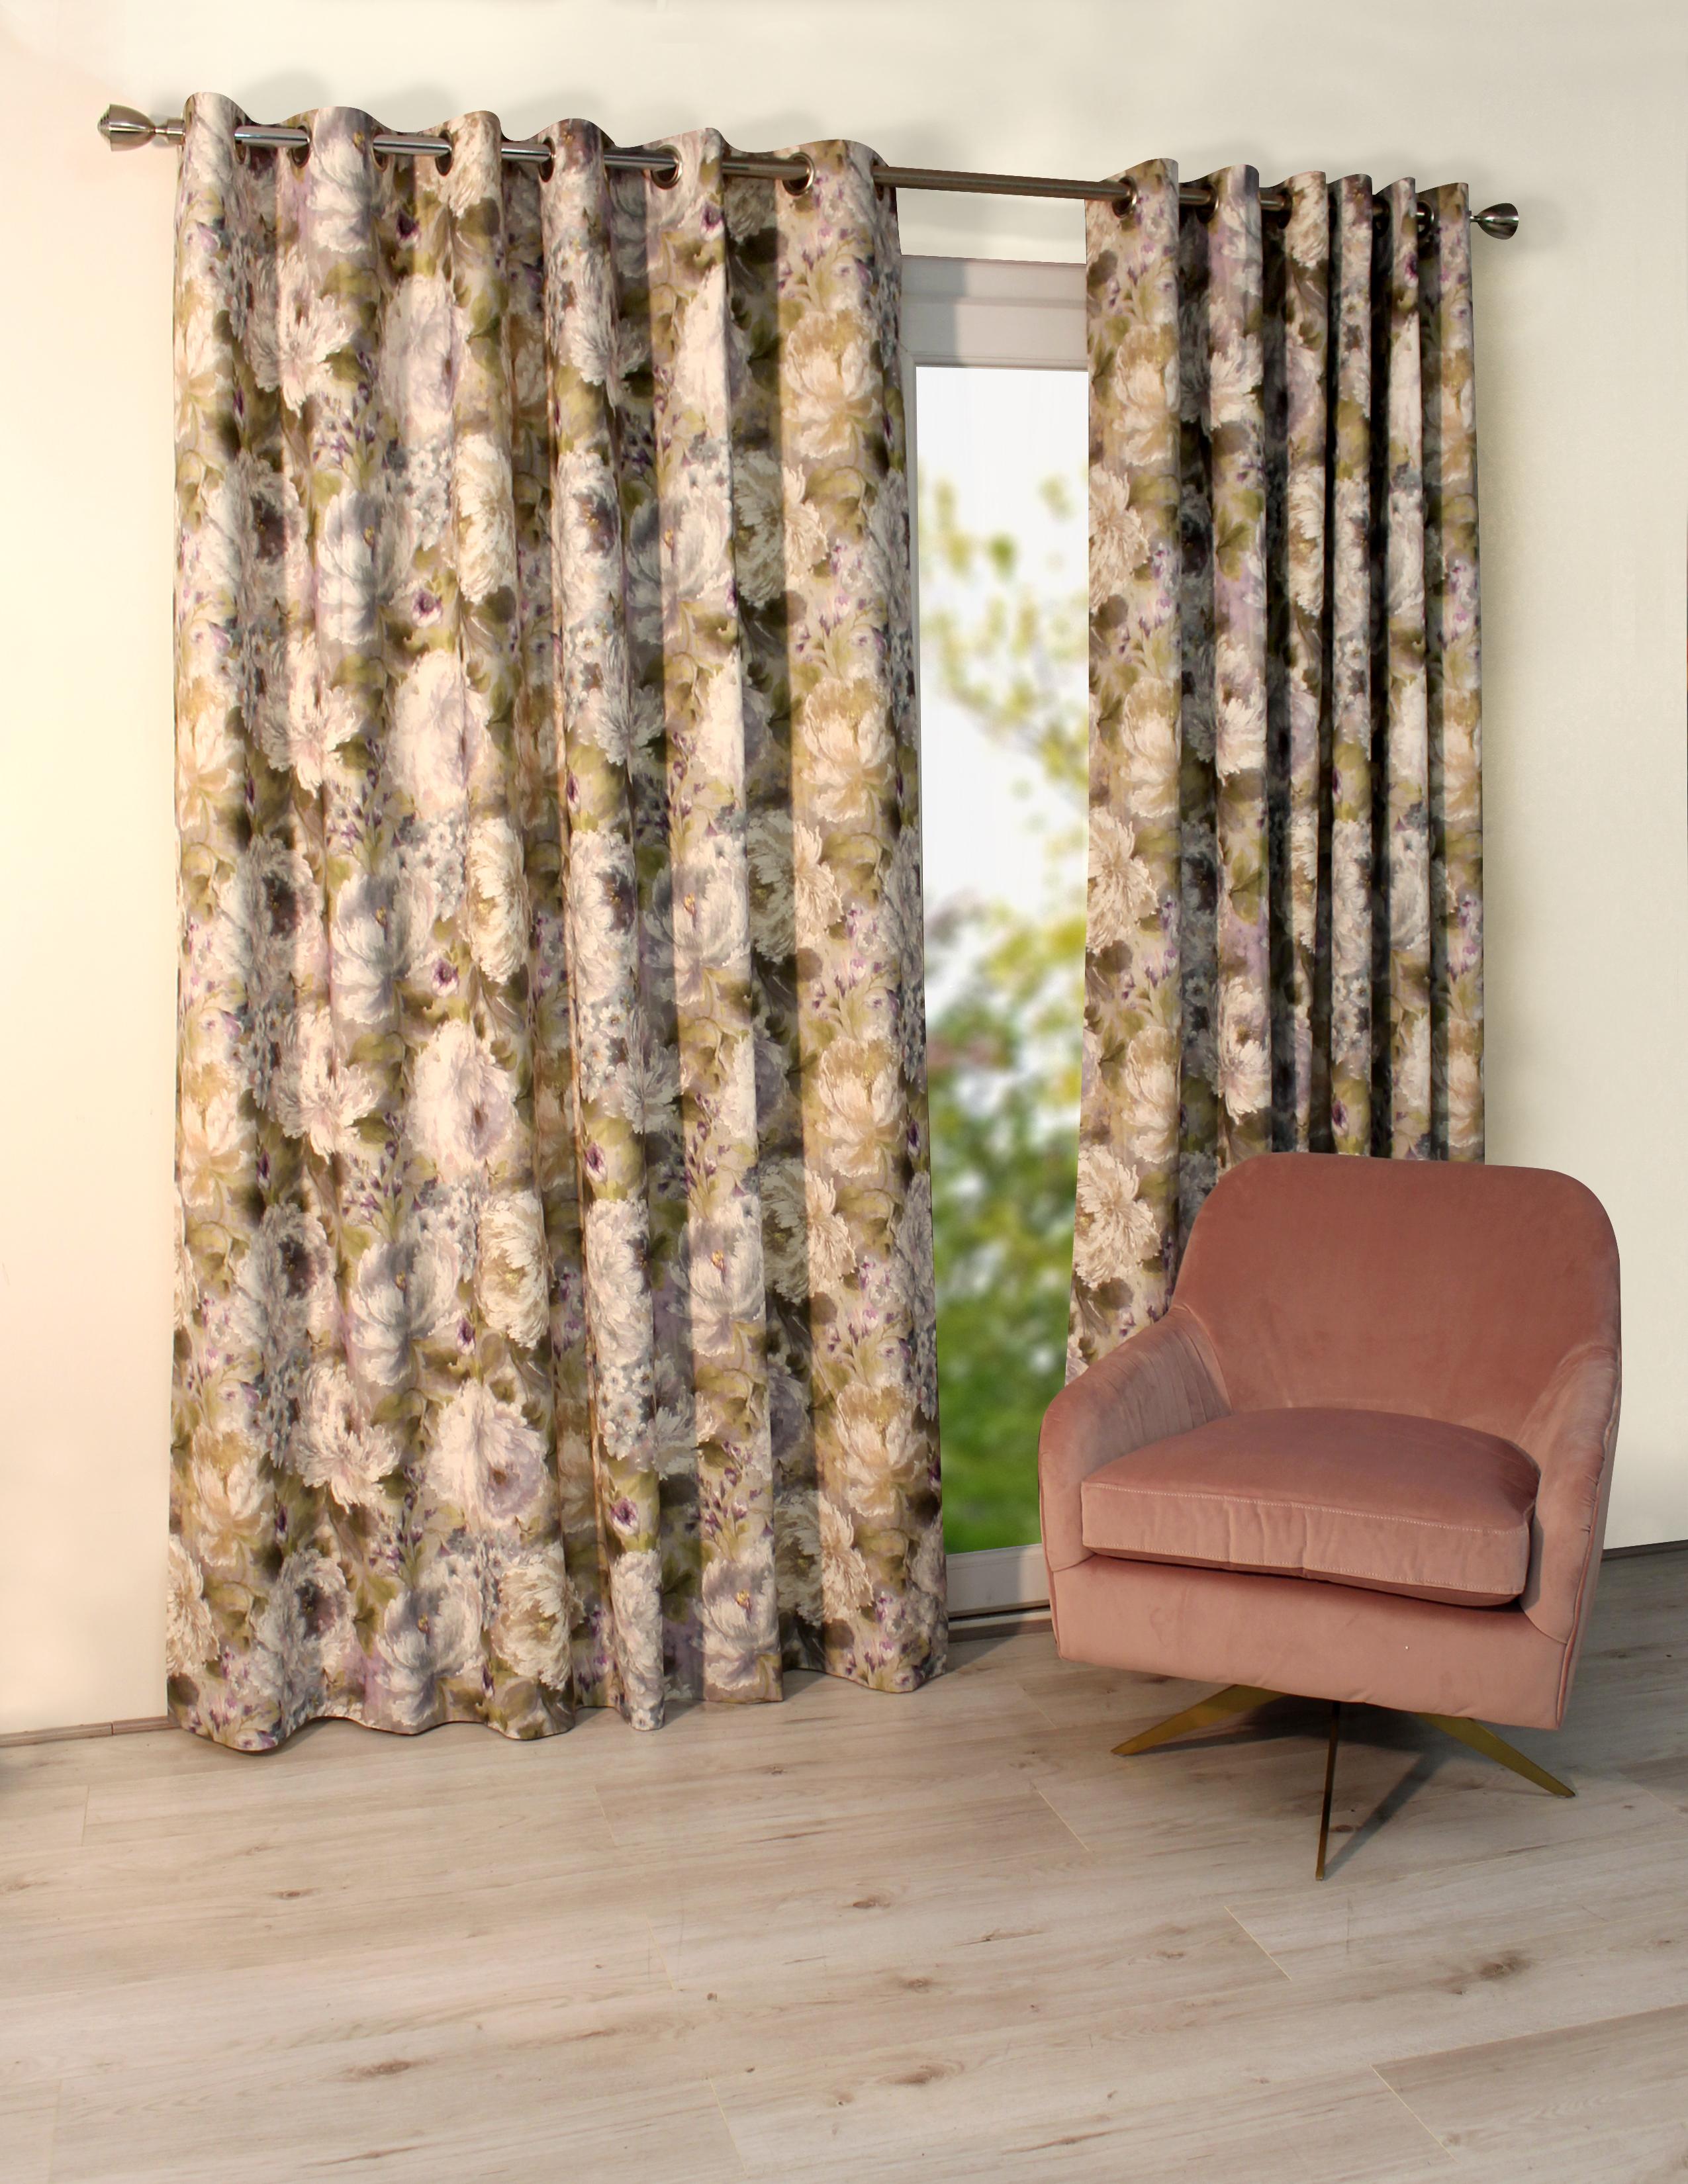 Primavera Moss Eyelet Curtains